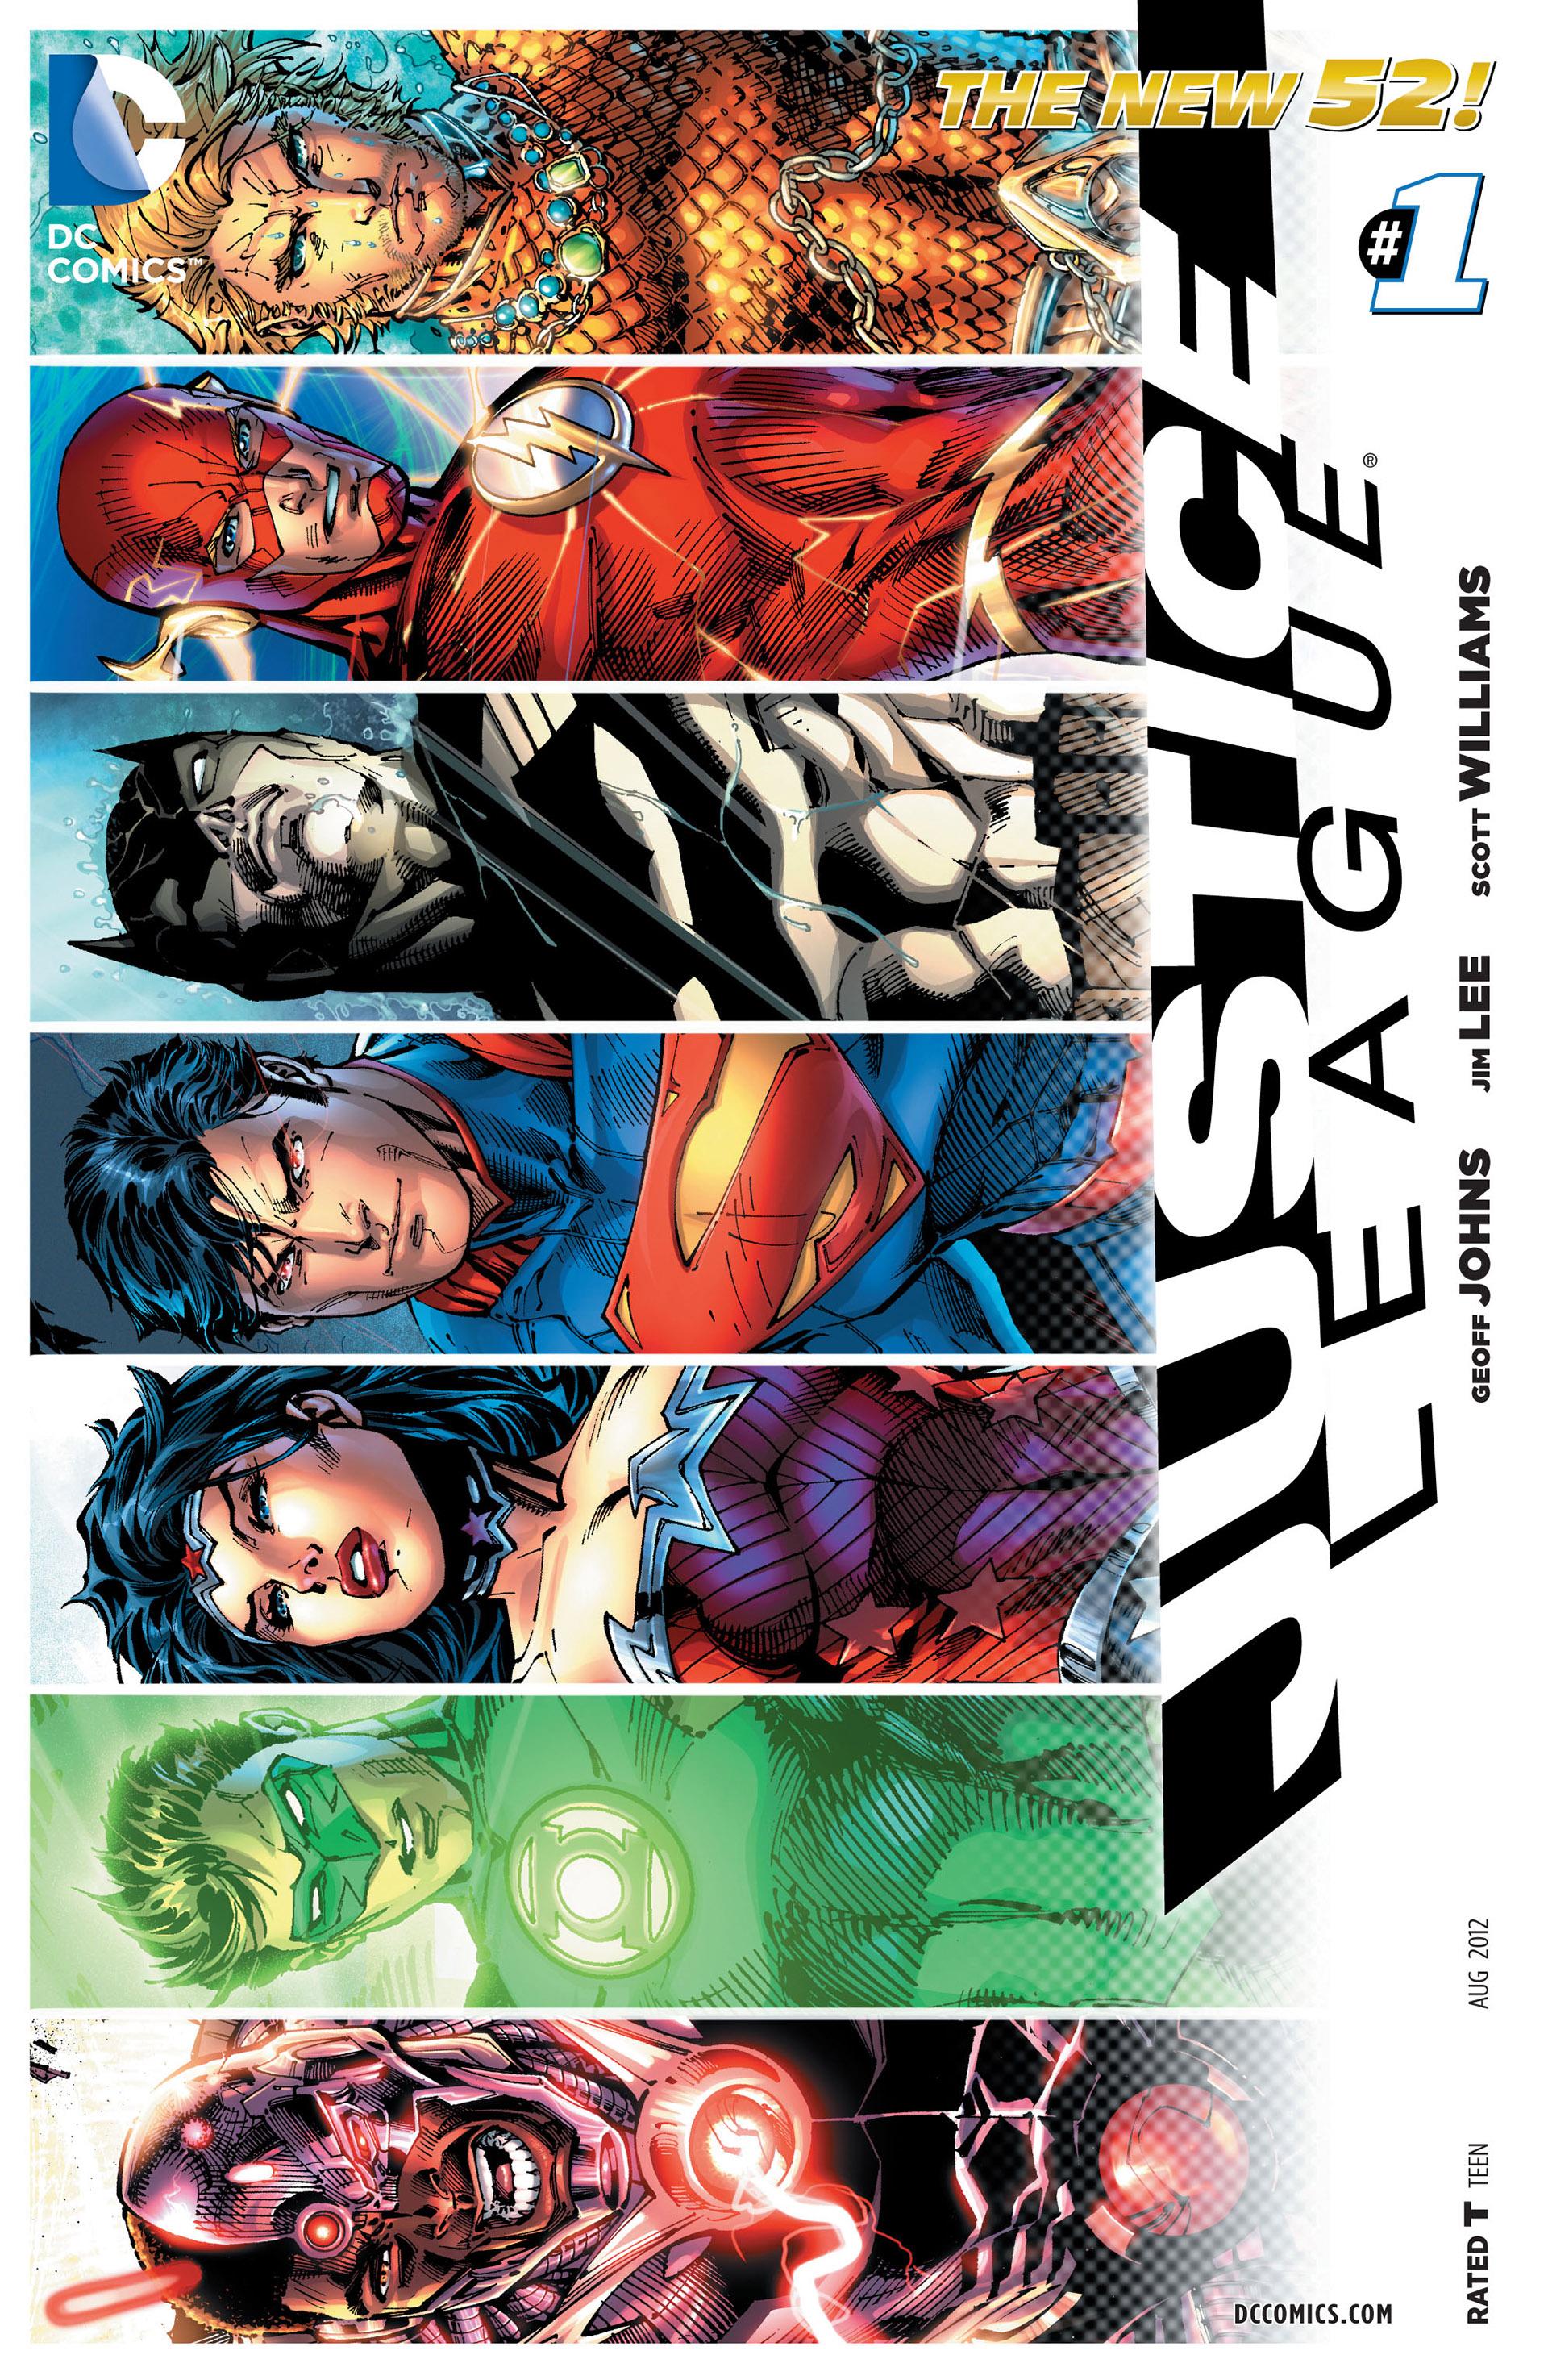 Justice League Vol 2 1 Eighth Printing Variant.jpg